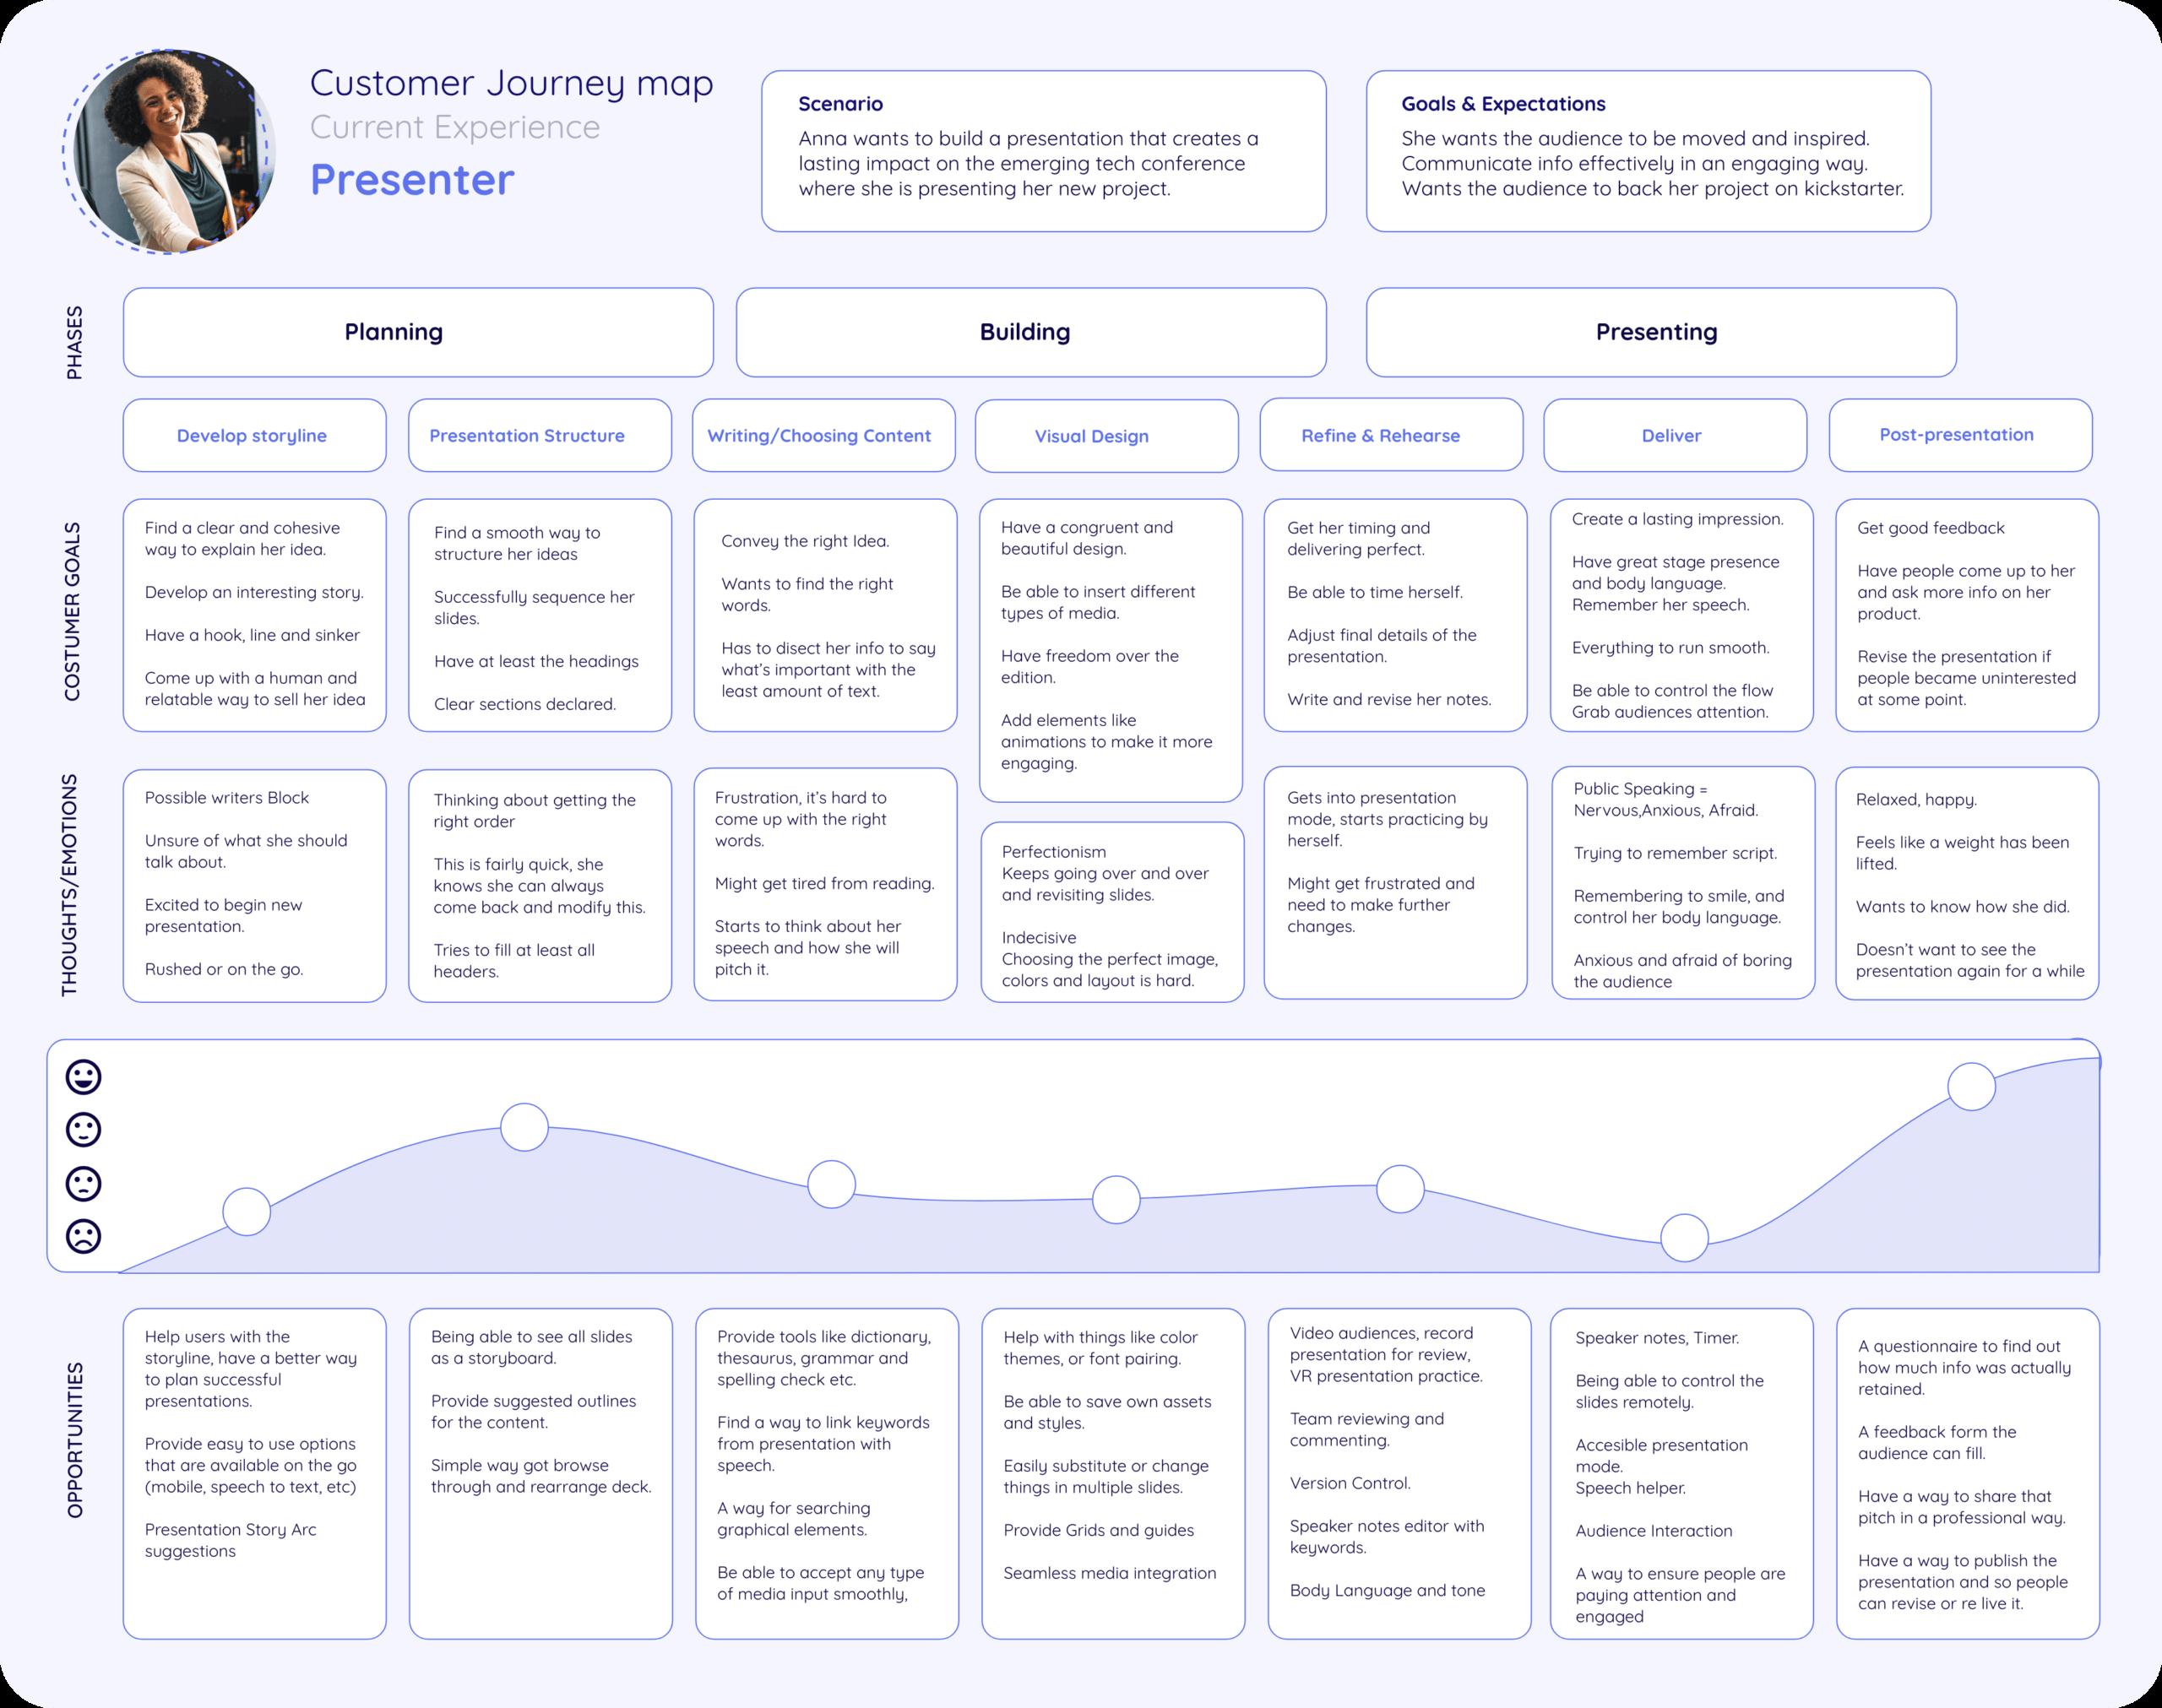 Customer Journey Map: Presenter